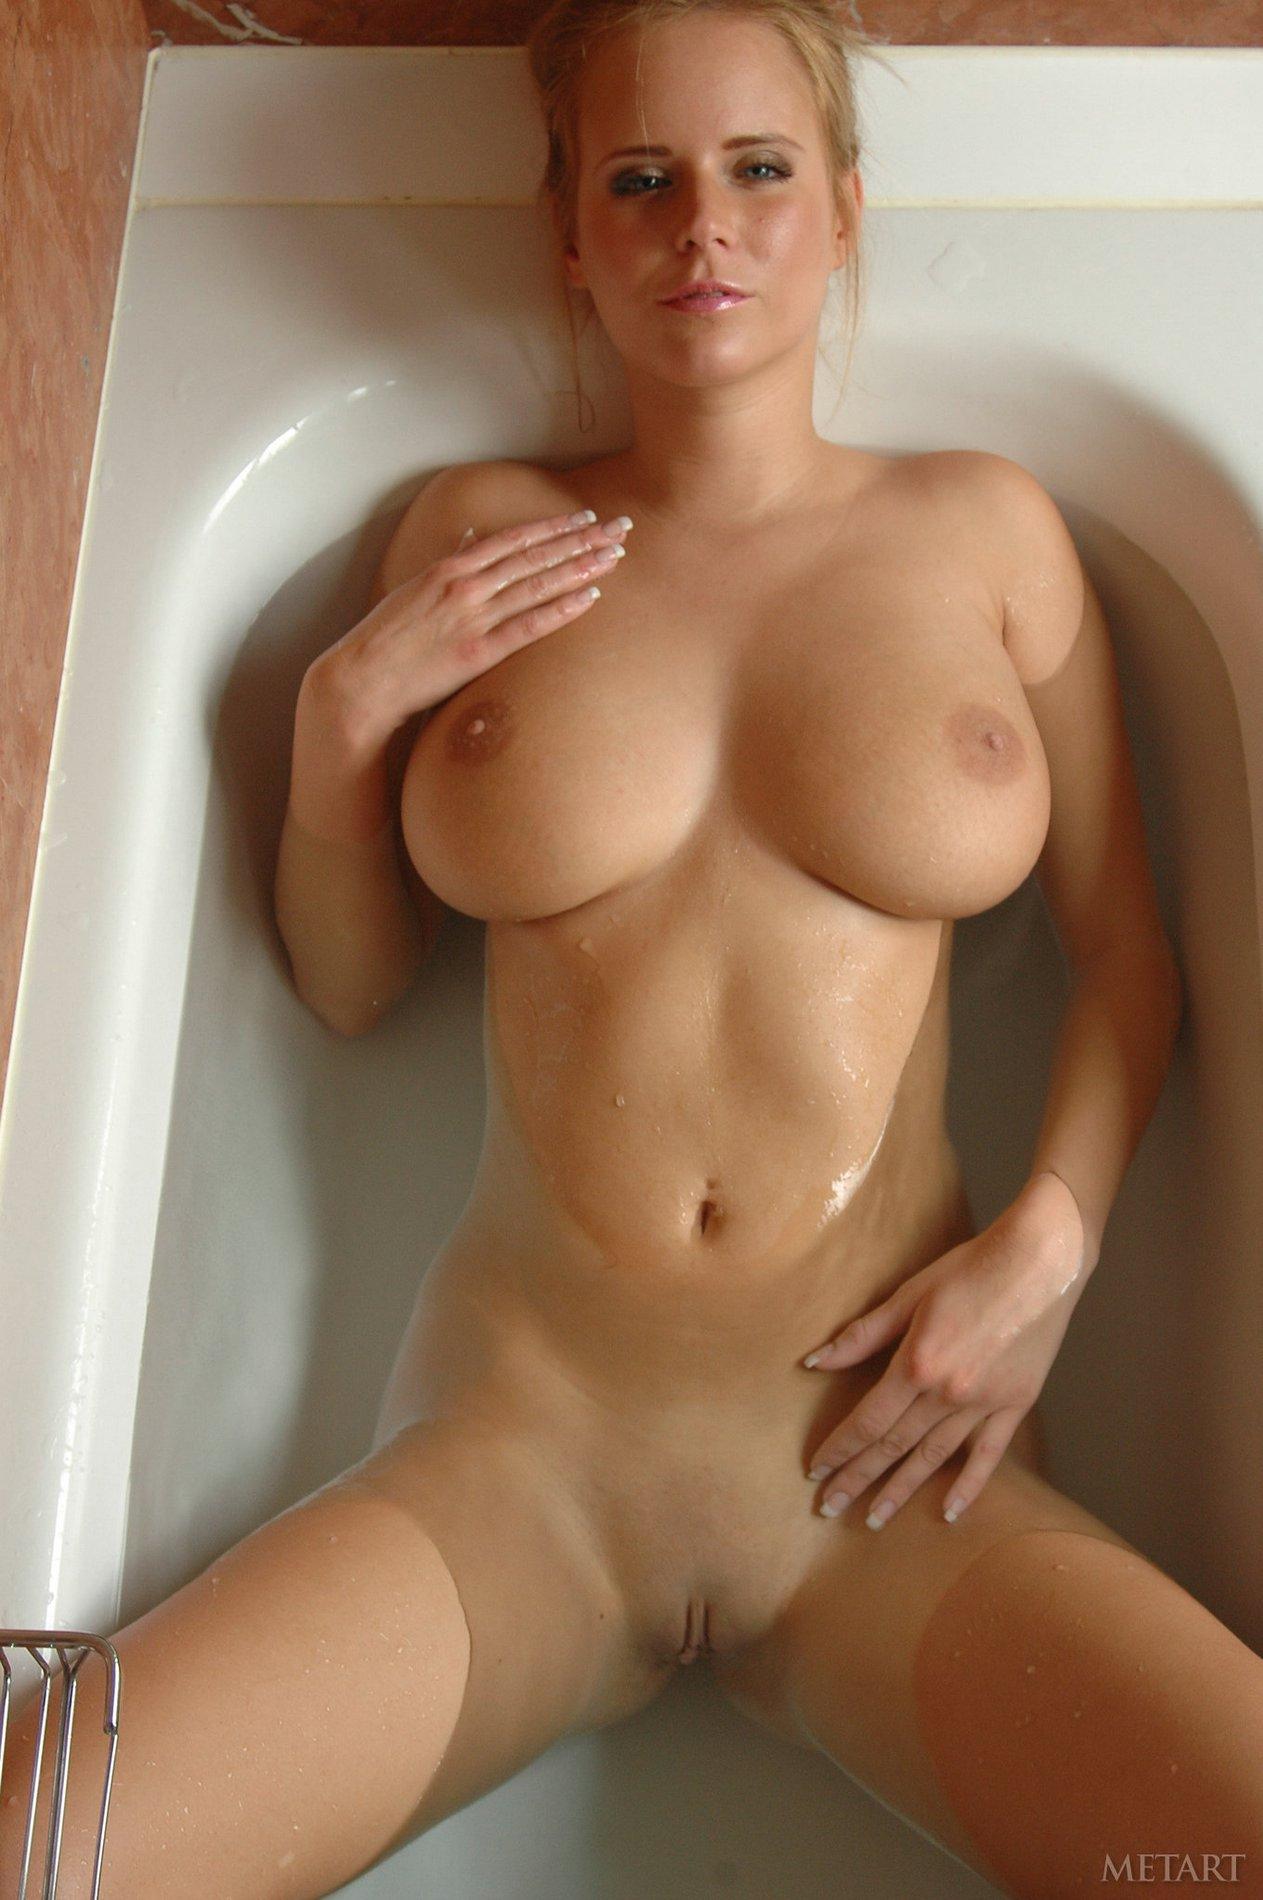 Busty Beauty Raylene Richards Takes A Hot Shower - My -5799